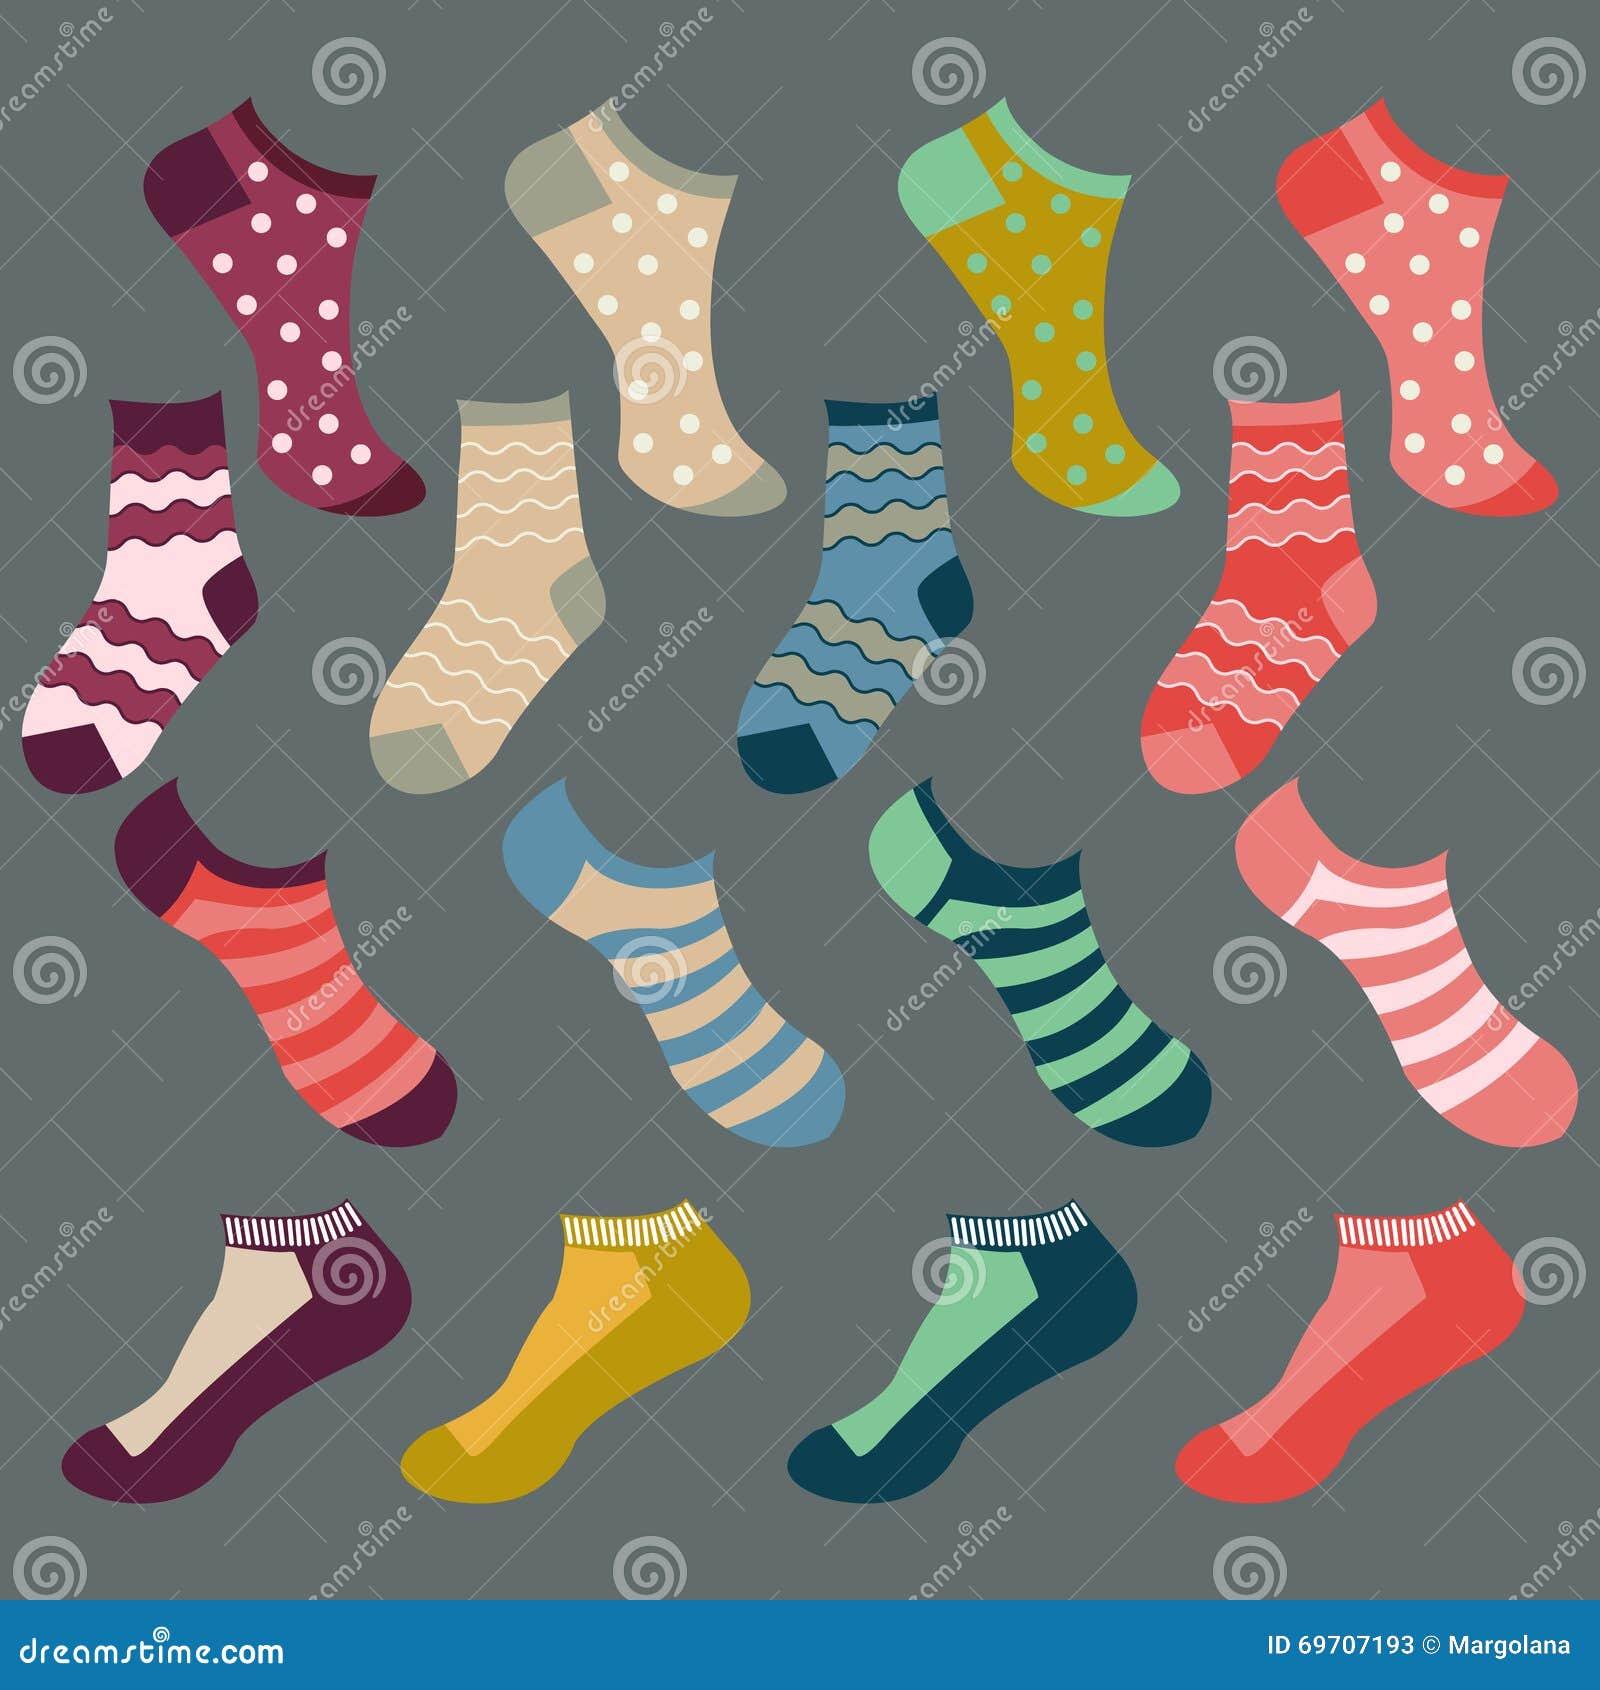 Different Types Of Socks Illustration Stock Vector Illustration